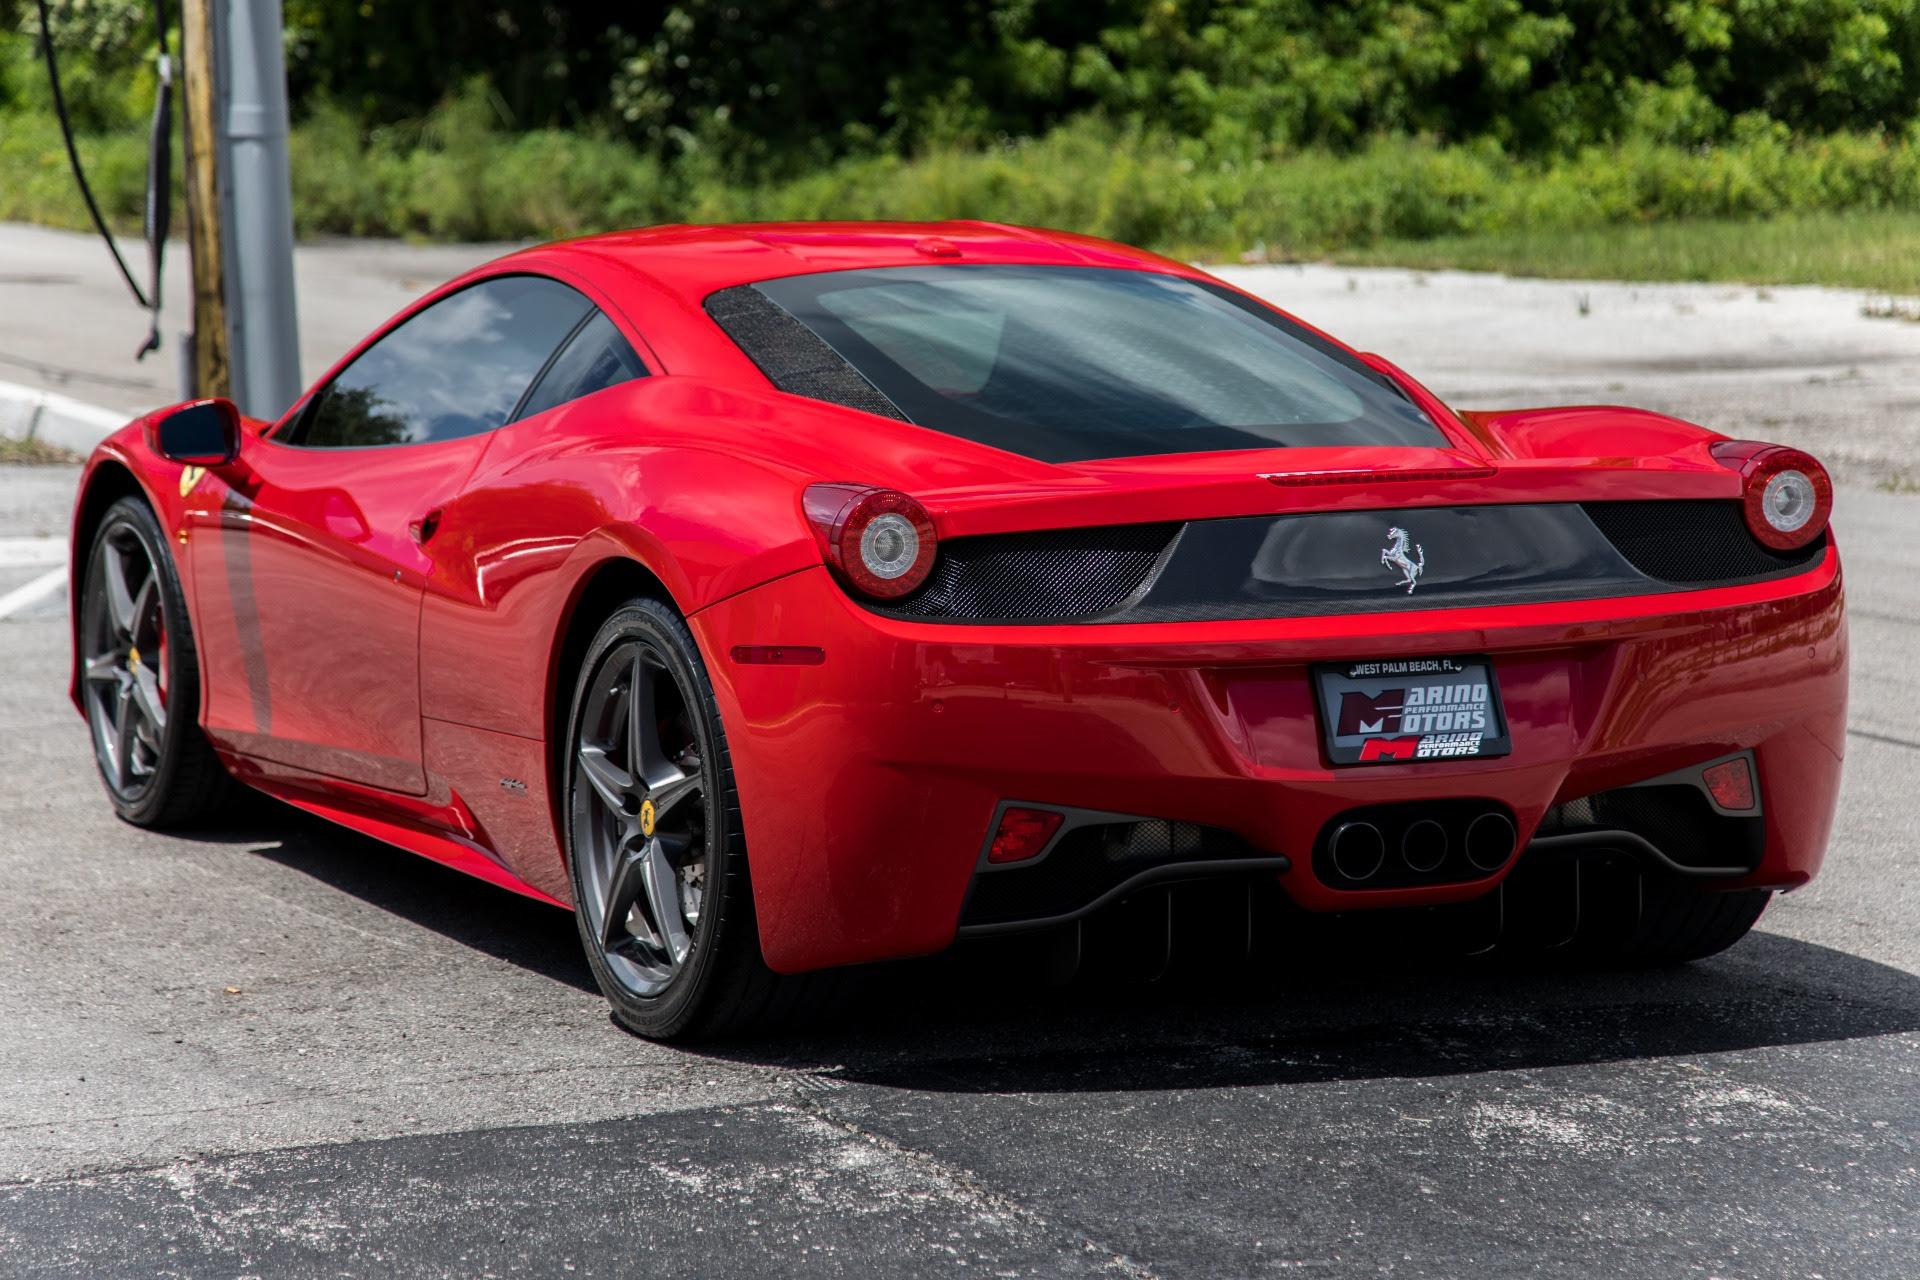 Used 2014 Ferrari 458 Italia For Sale 179900 Marino